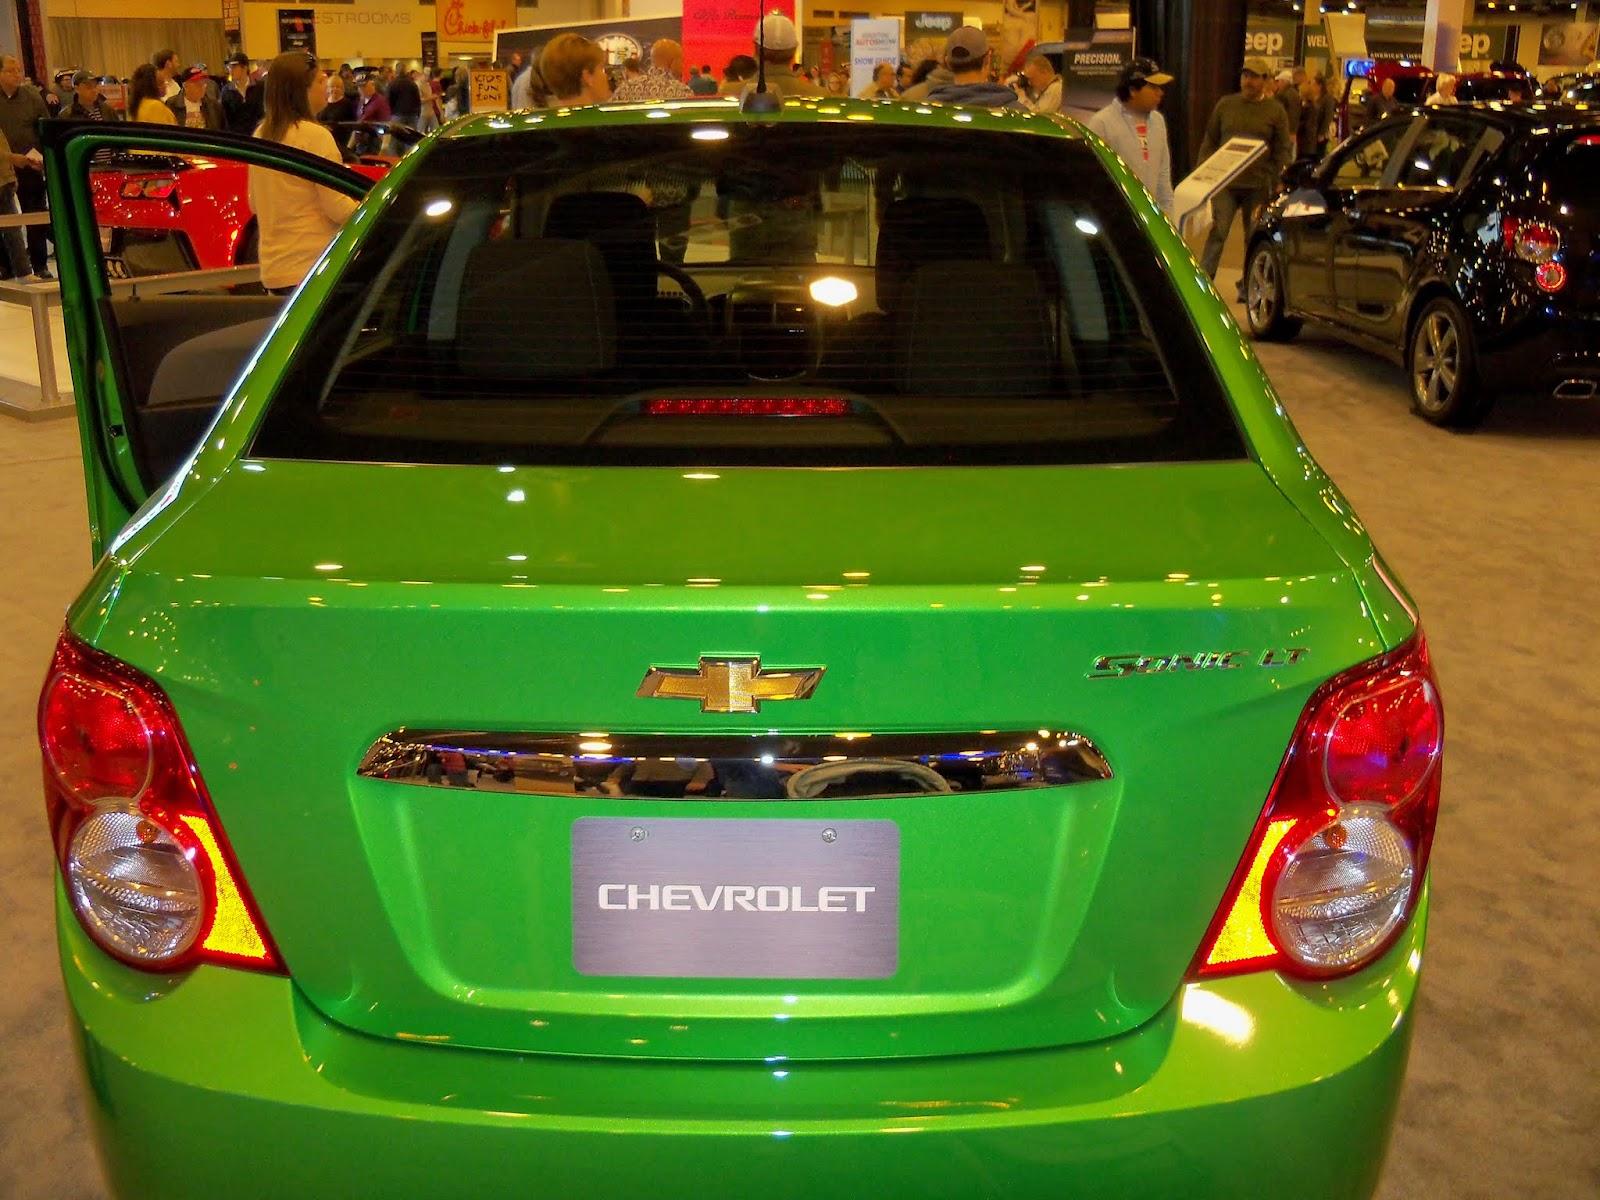 Houston Auto Show 2015 - 116_7276.JPG